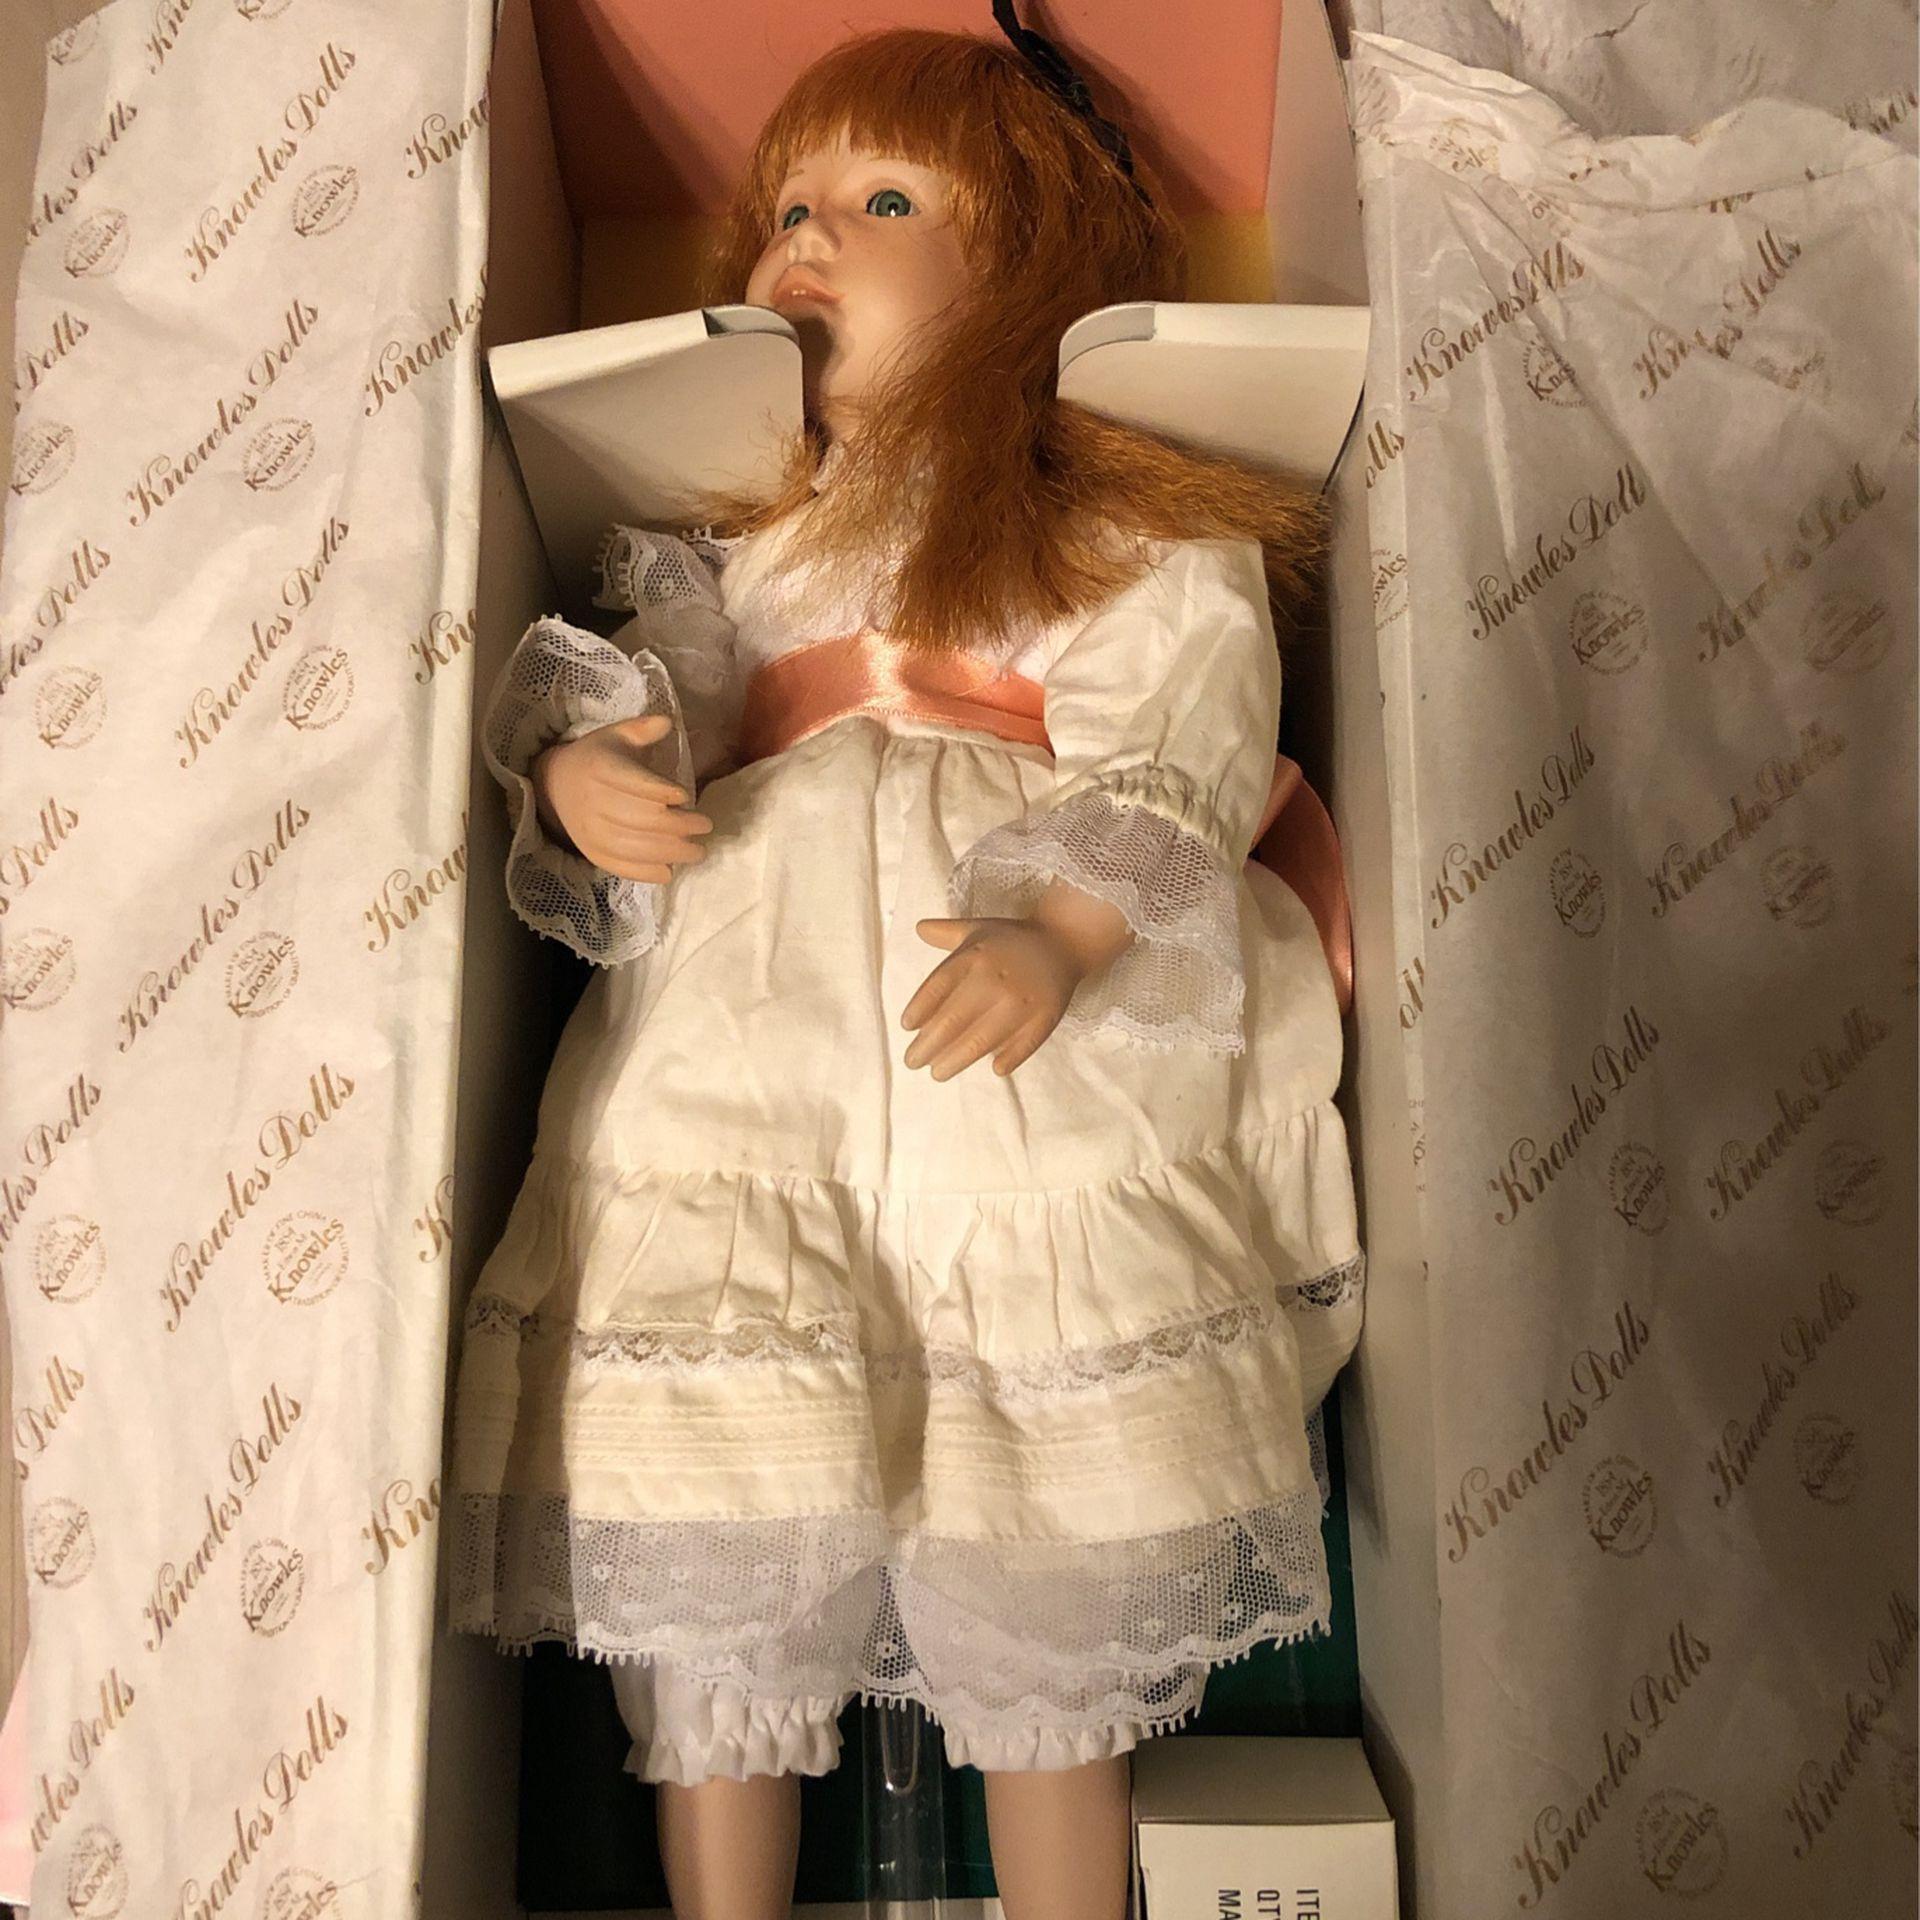 Polly's Tea Party Porcelain Doll